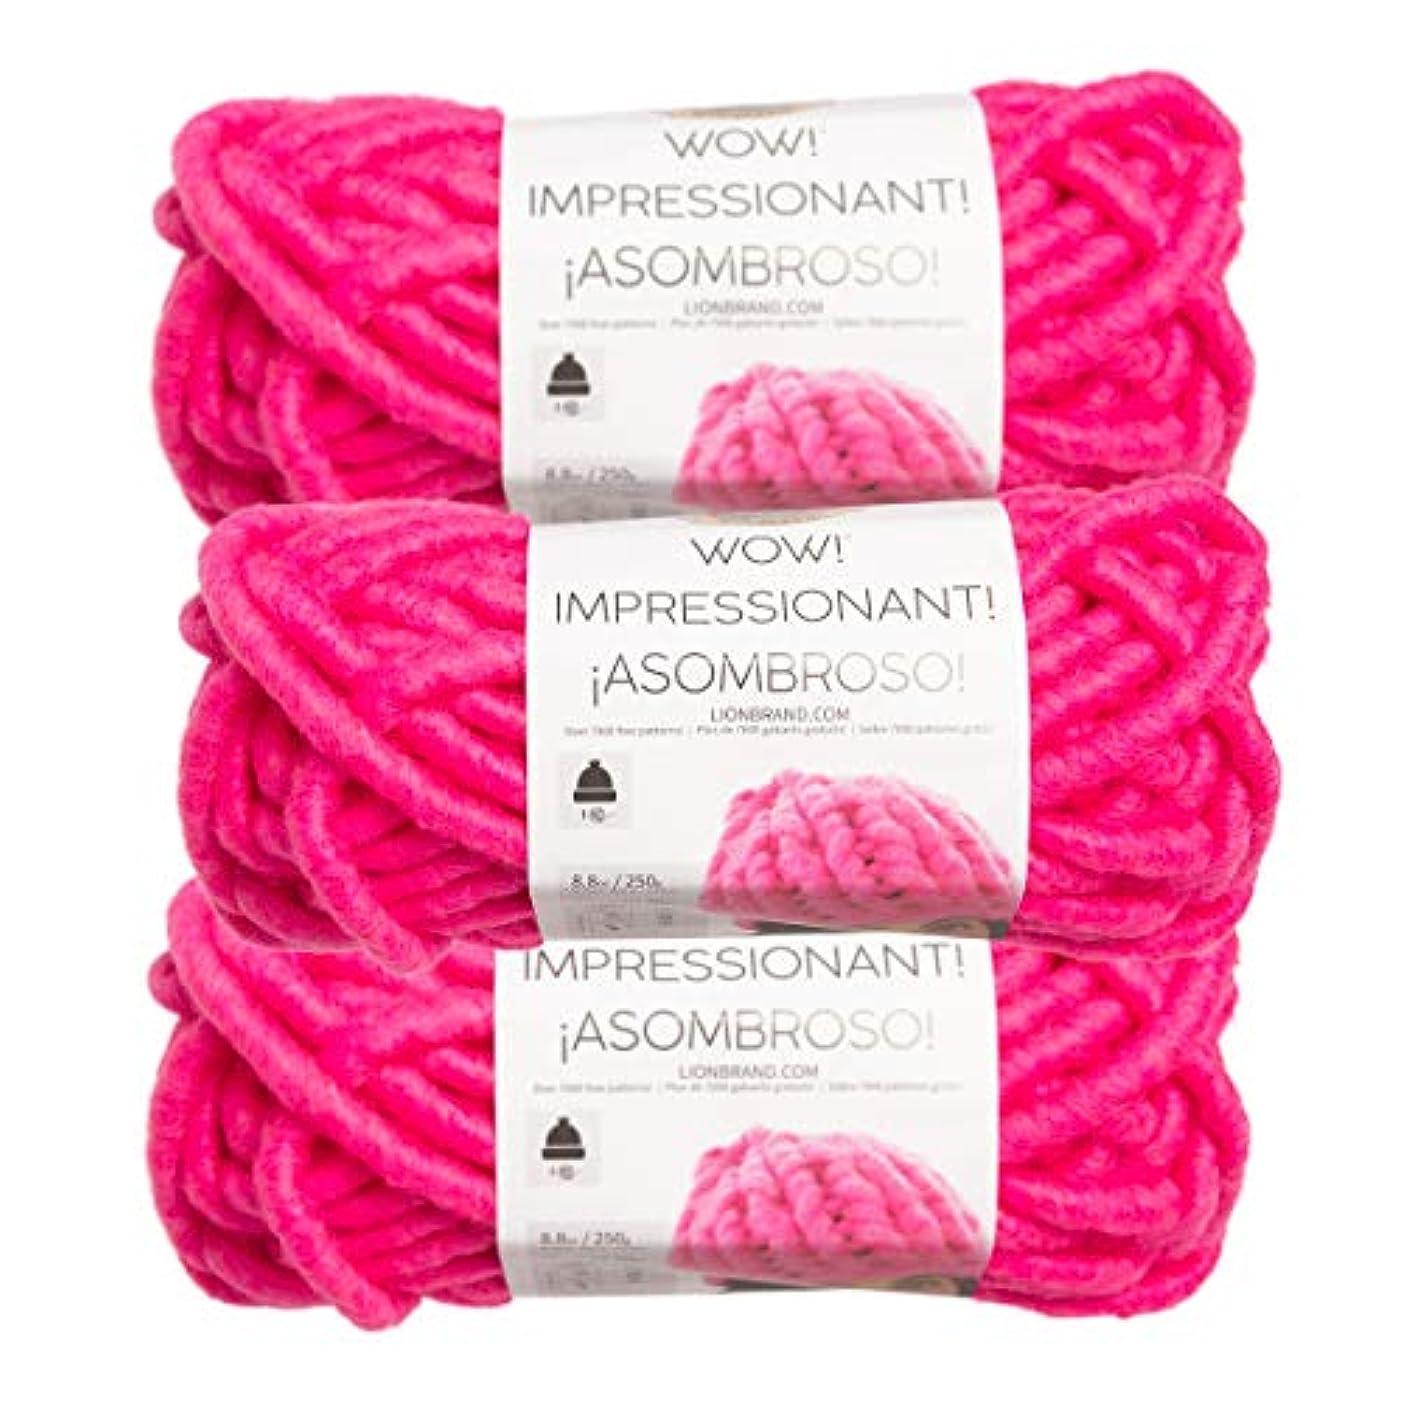 Lion Brand (3 Pack) Wow! Acrylic & Wool Soft Bright Fuchsia Pink Yarn for Knitting Crocheting Jumbo #7